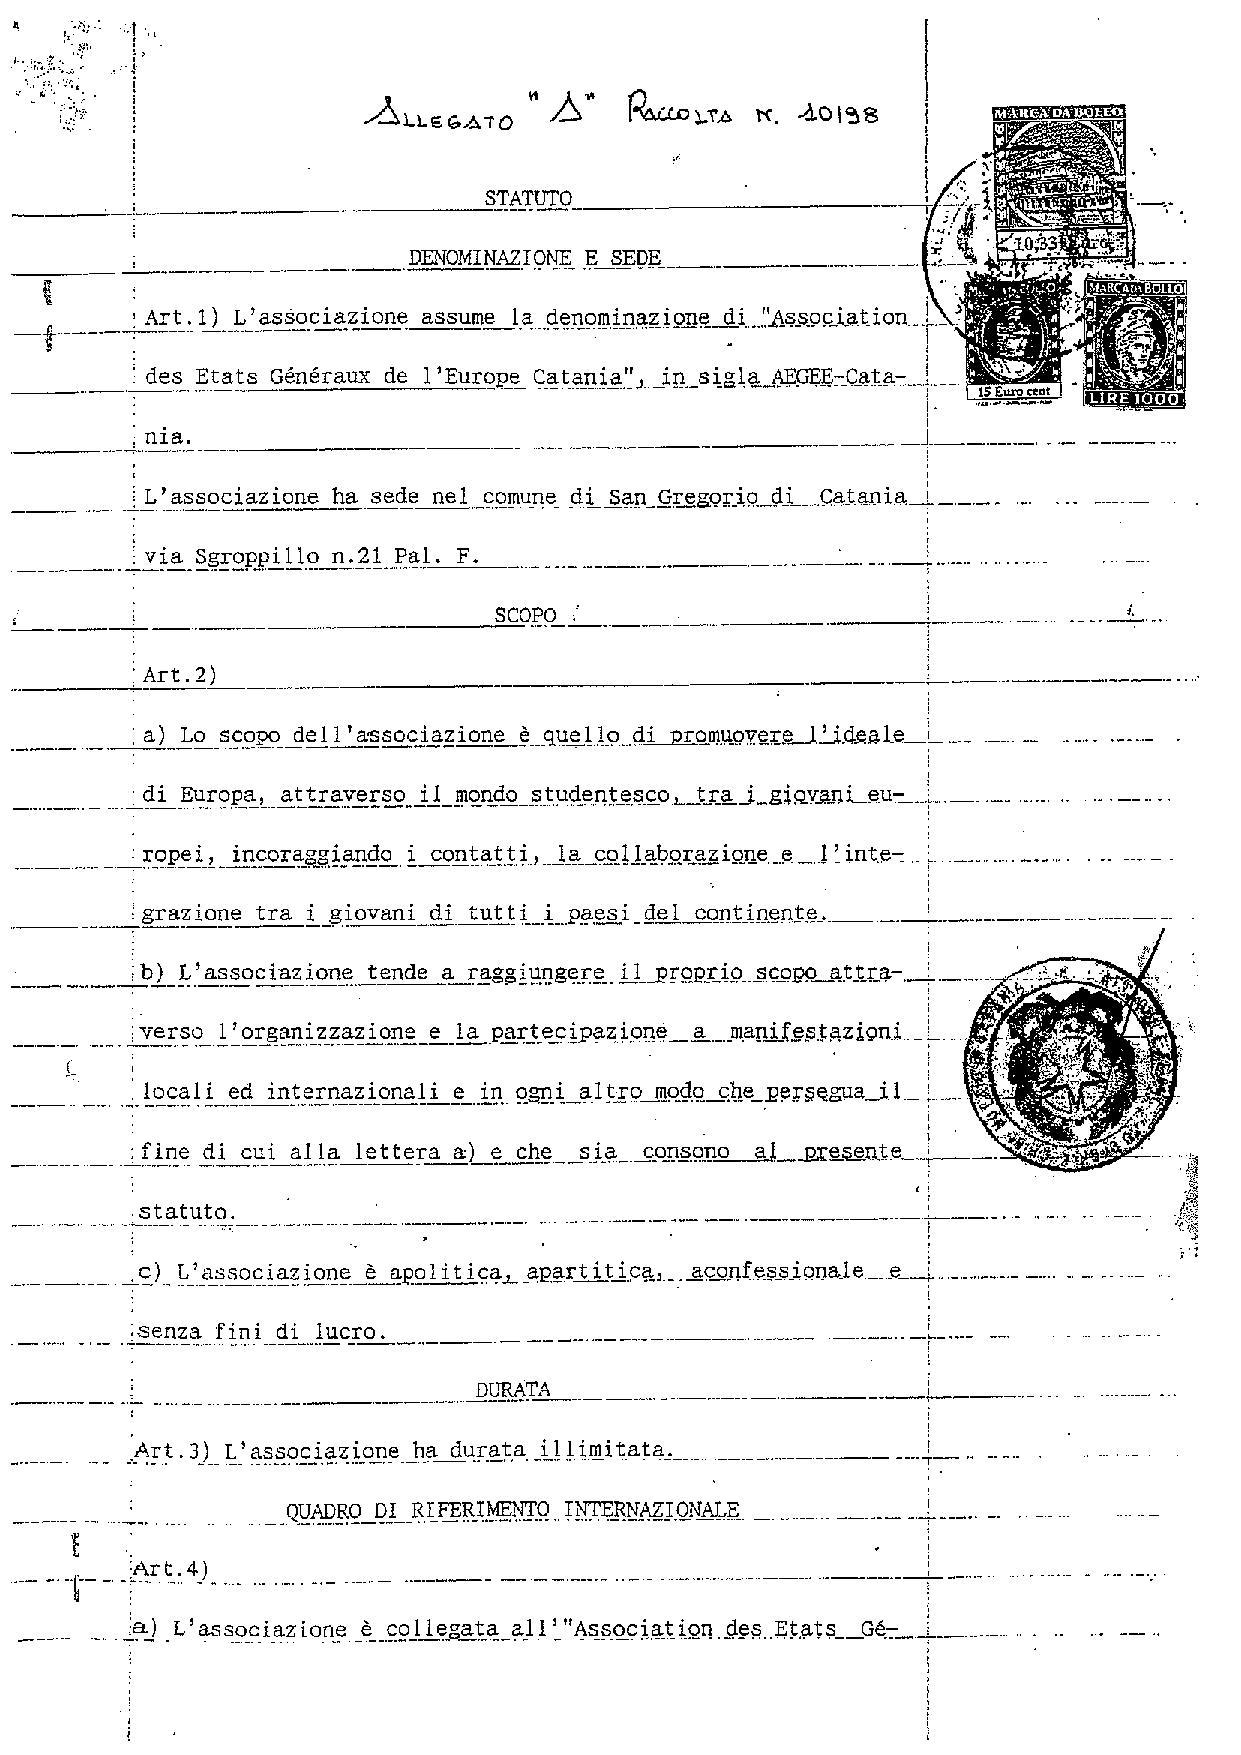 statuto-aegee-catania-page-001